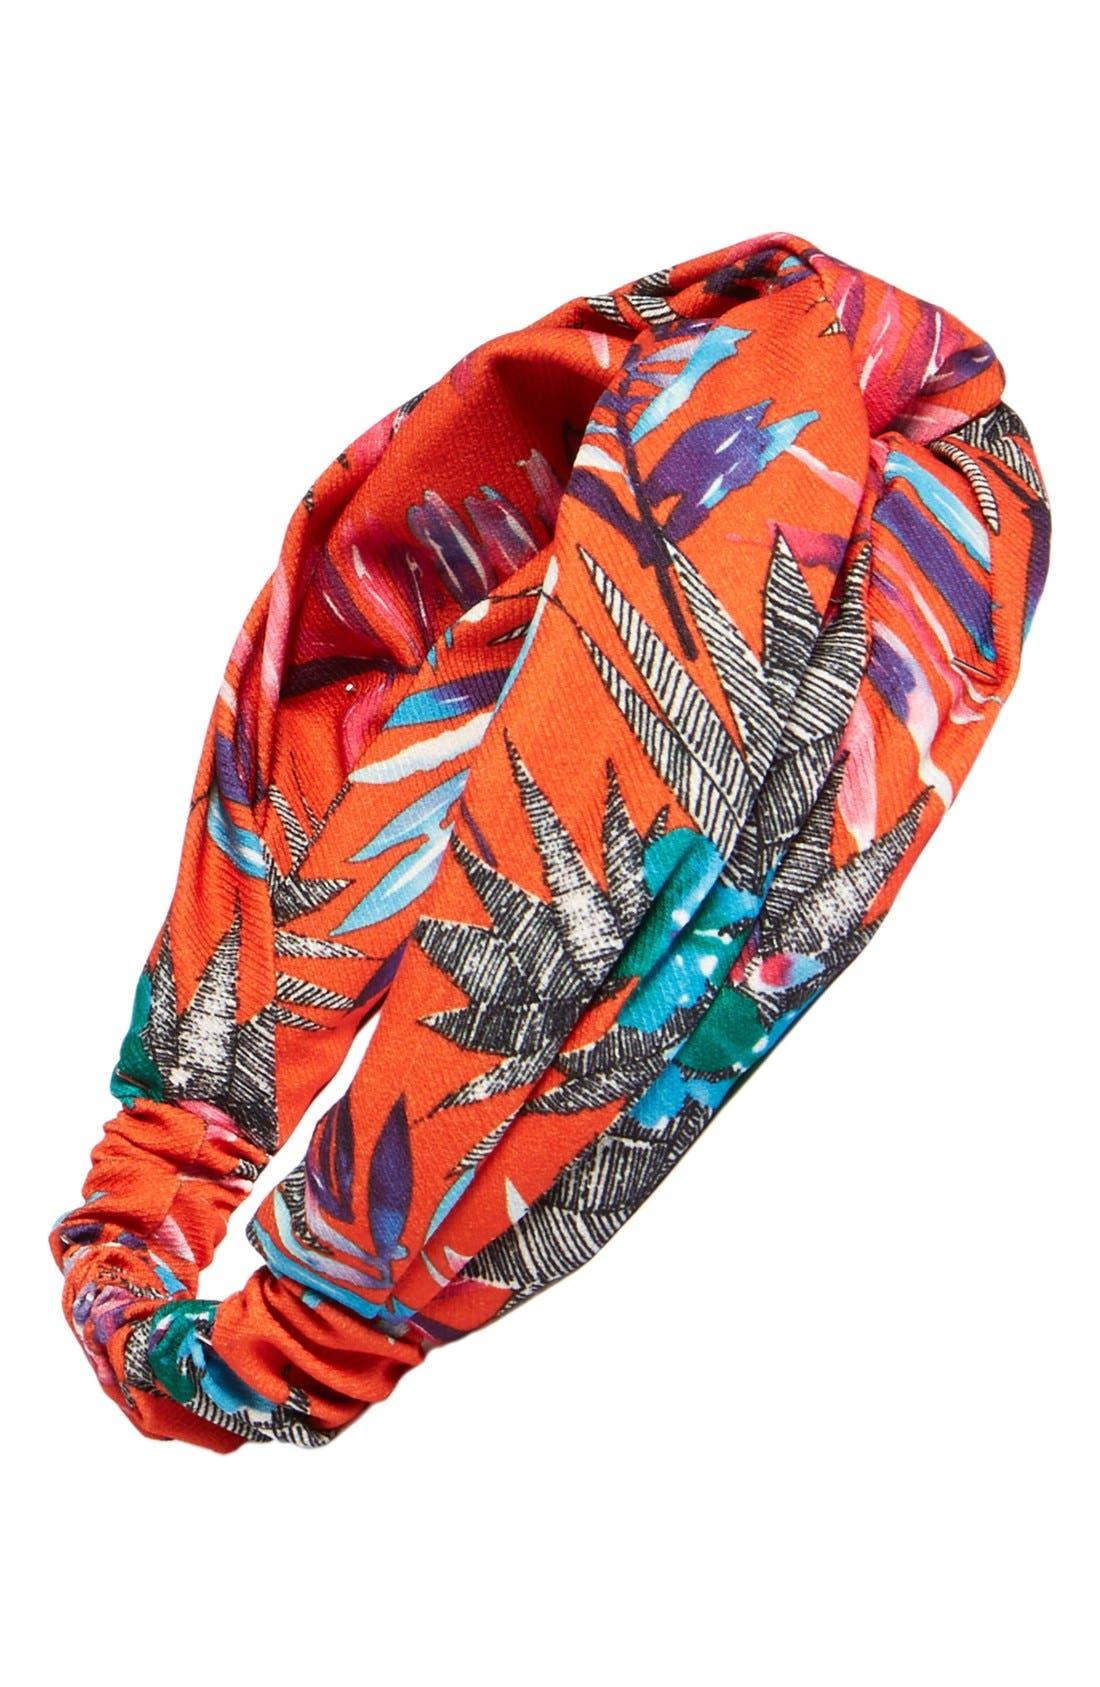 Main Image - Eugenia Kim Tropical Print Turban Headband